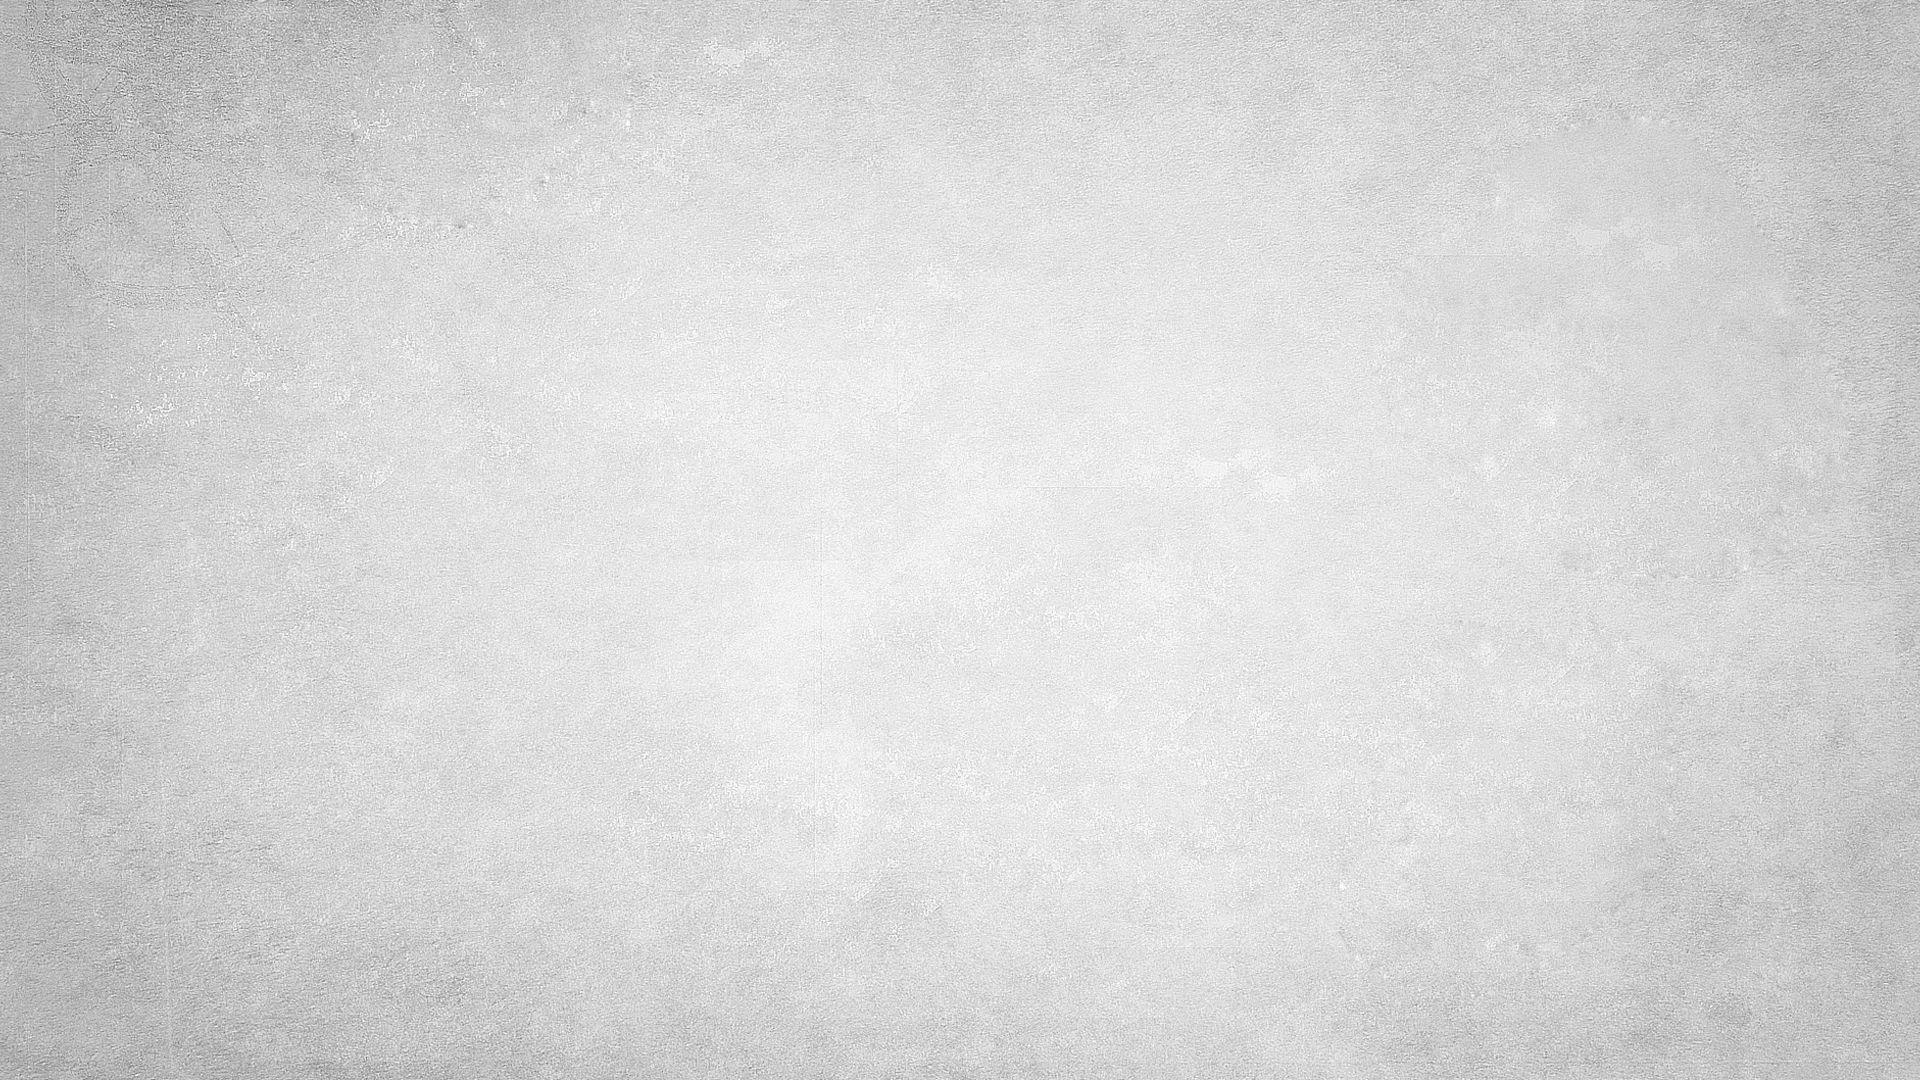 Light Grey PC Wallpaper HD